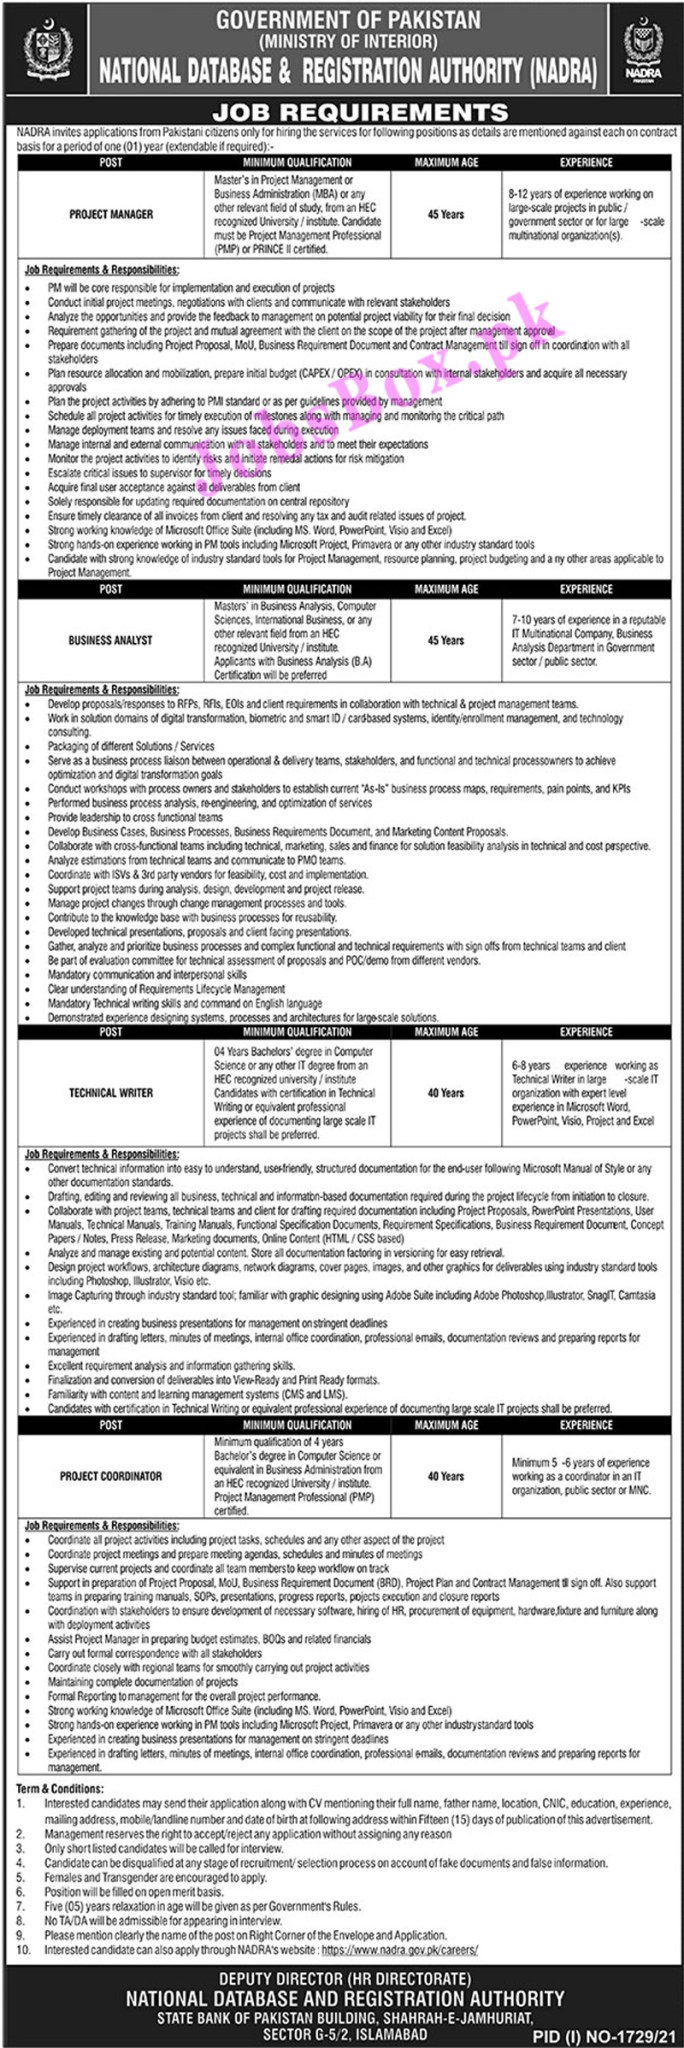 https://www.nadra.gov.pk/careers/ - NADRA National Database and Registration Authority Jobs 2021 in Pakistan